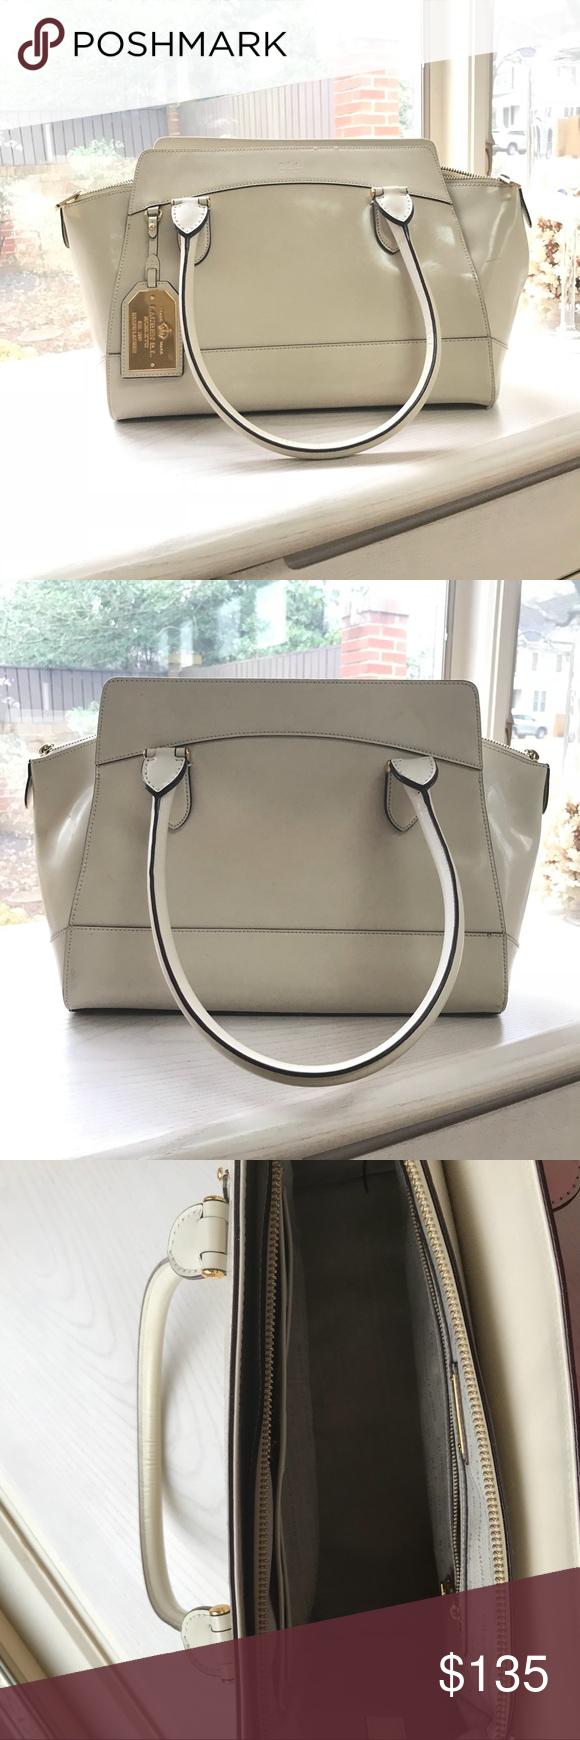 ... 01 preview 1e3dc 0f33b  germany ralph lauren cream handbag beautiful ralph  lauren cream handbag. elegant. like new. ea6ac8ec9b203